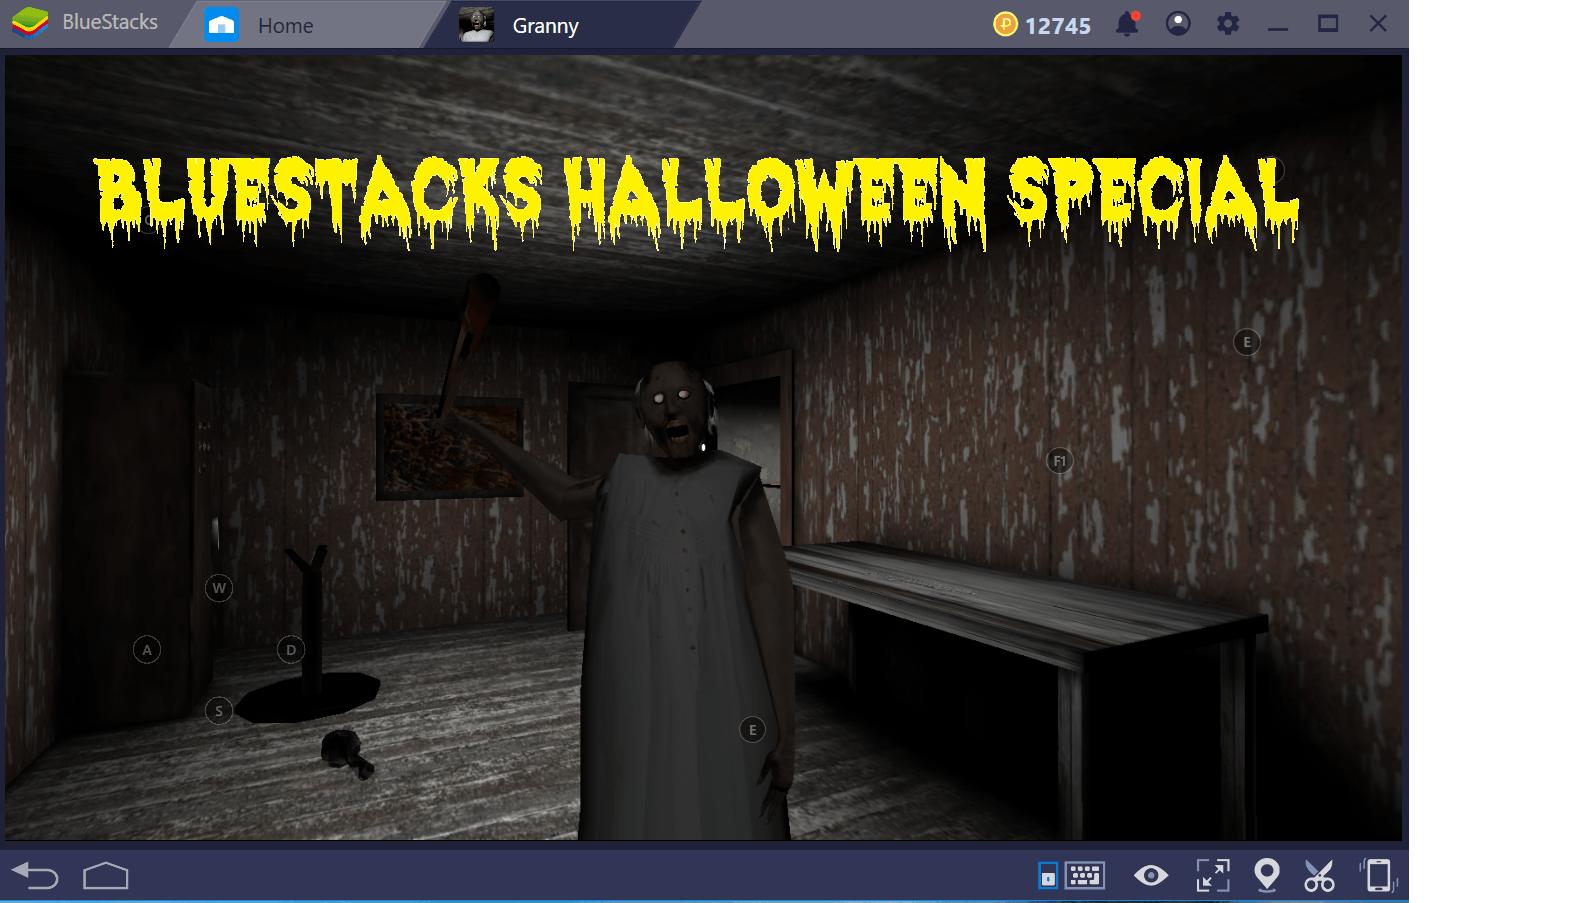 Top 5 Horror Games to Play on BlueStacks this Halloween Season